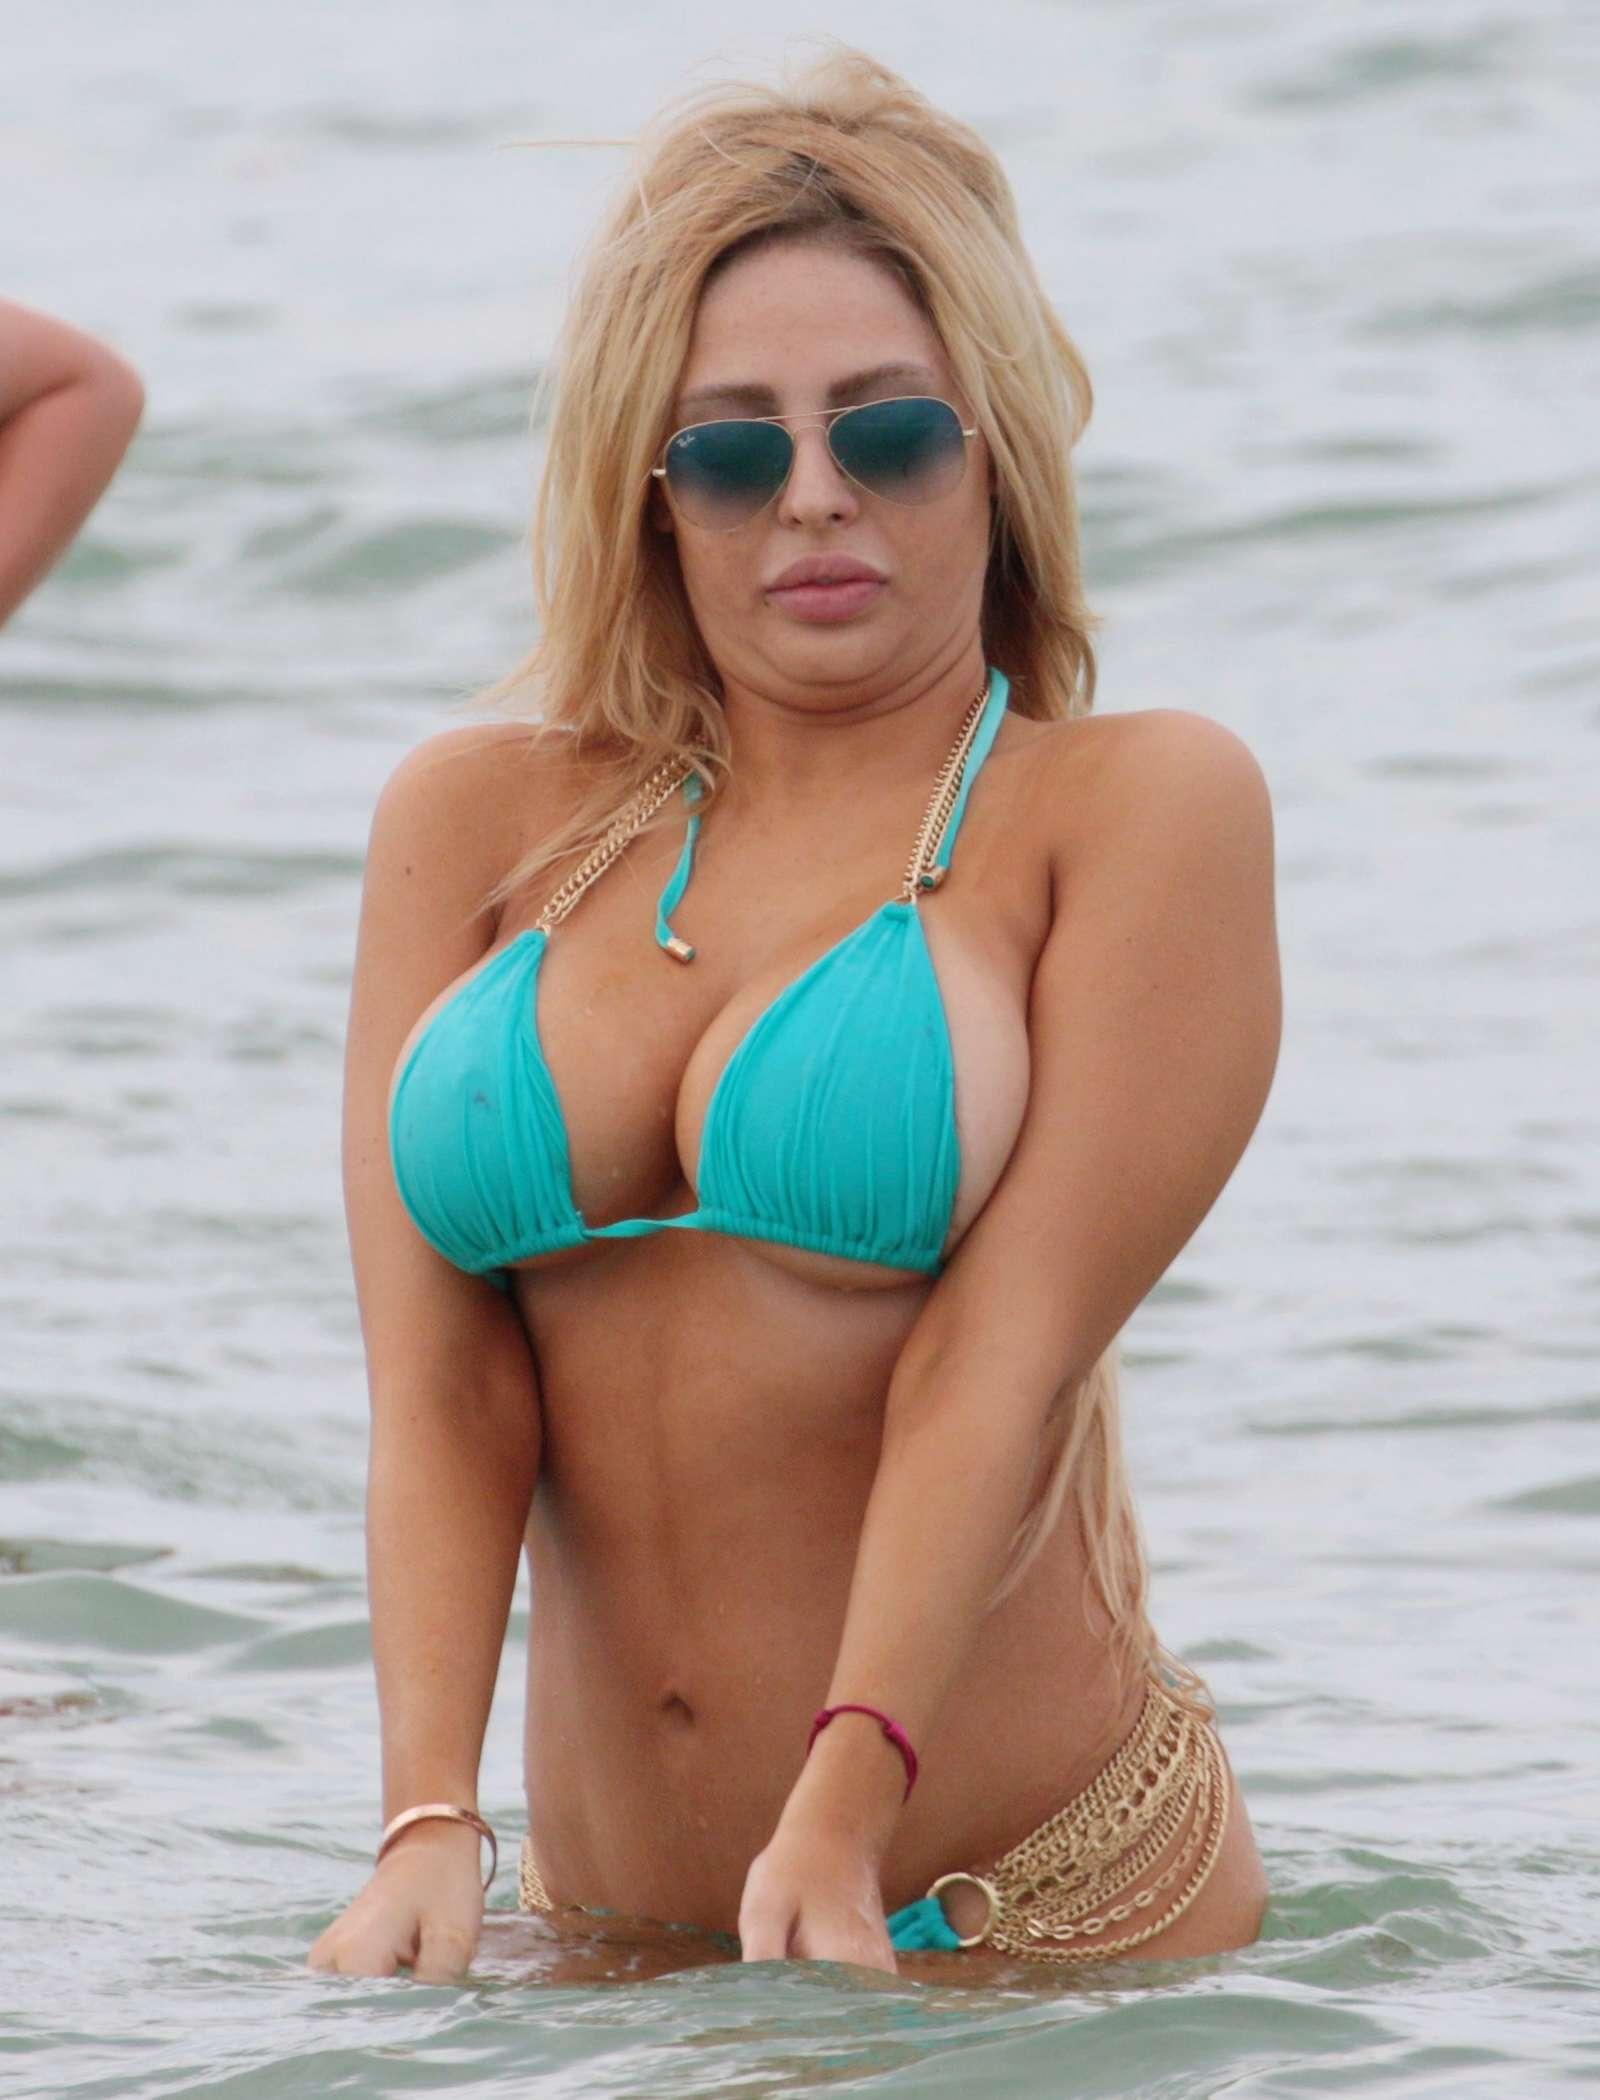 Francesca Larrain nude (83 photo) Hot, 2019, butt